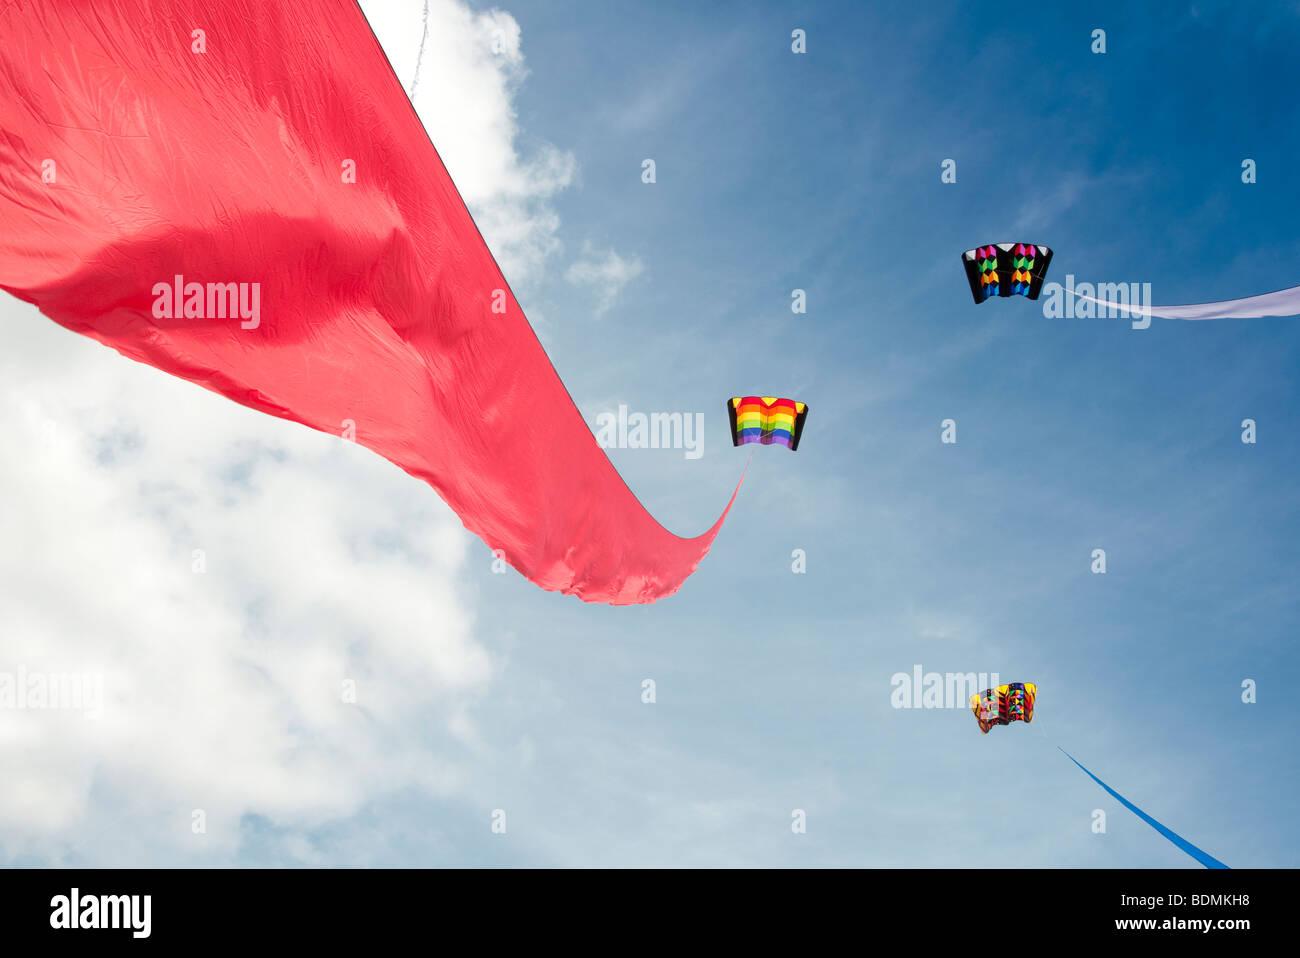 kites at a kite festival - Stock Image